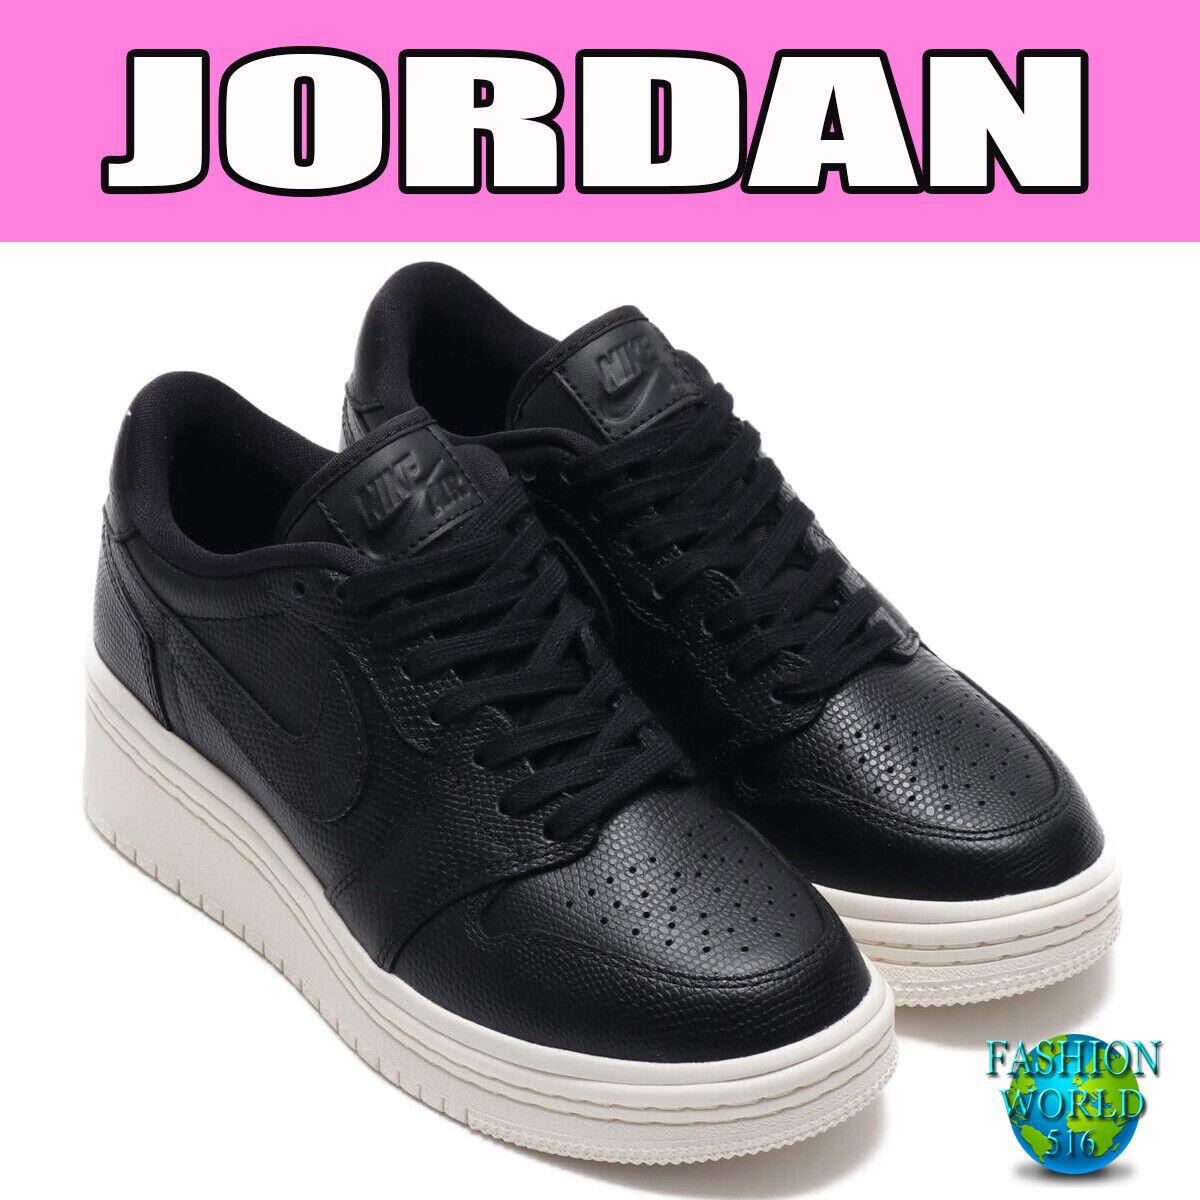 Nike Womens Size 75 Air Jordan 1 RE Low LIFTD Phantom Women Wedge Shoes AO1334